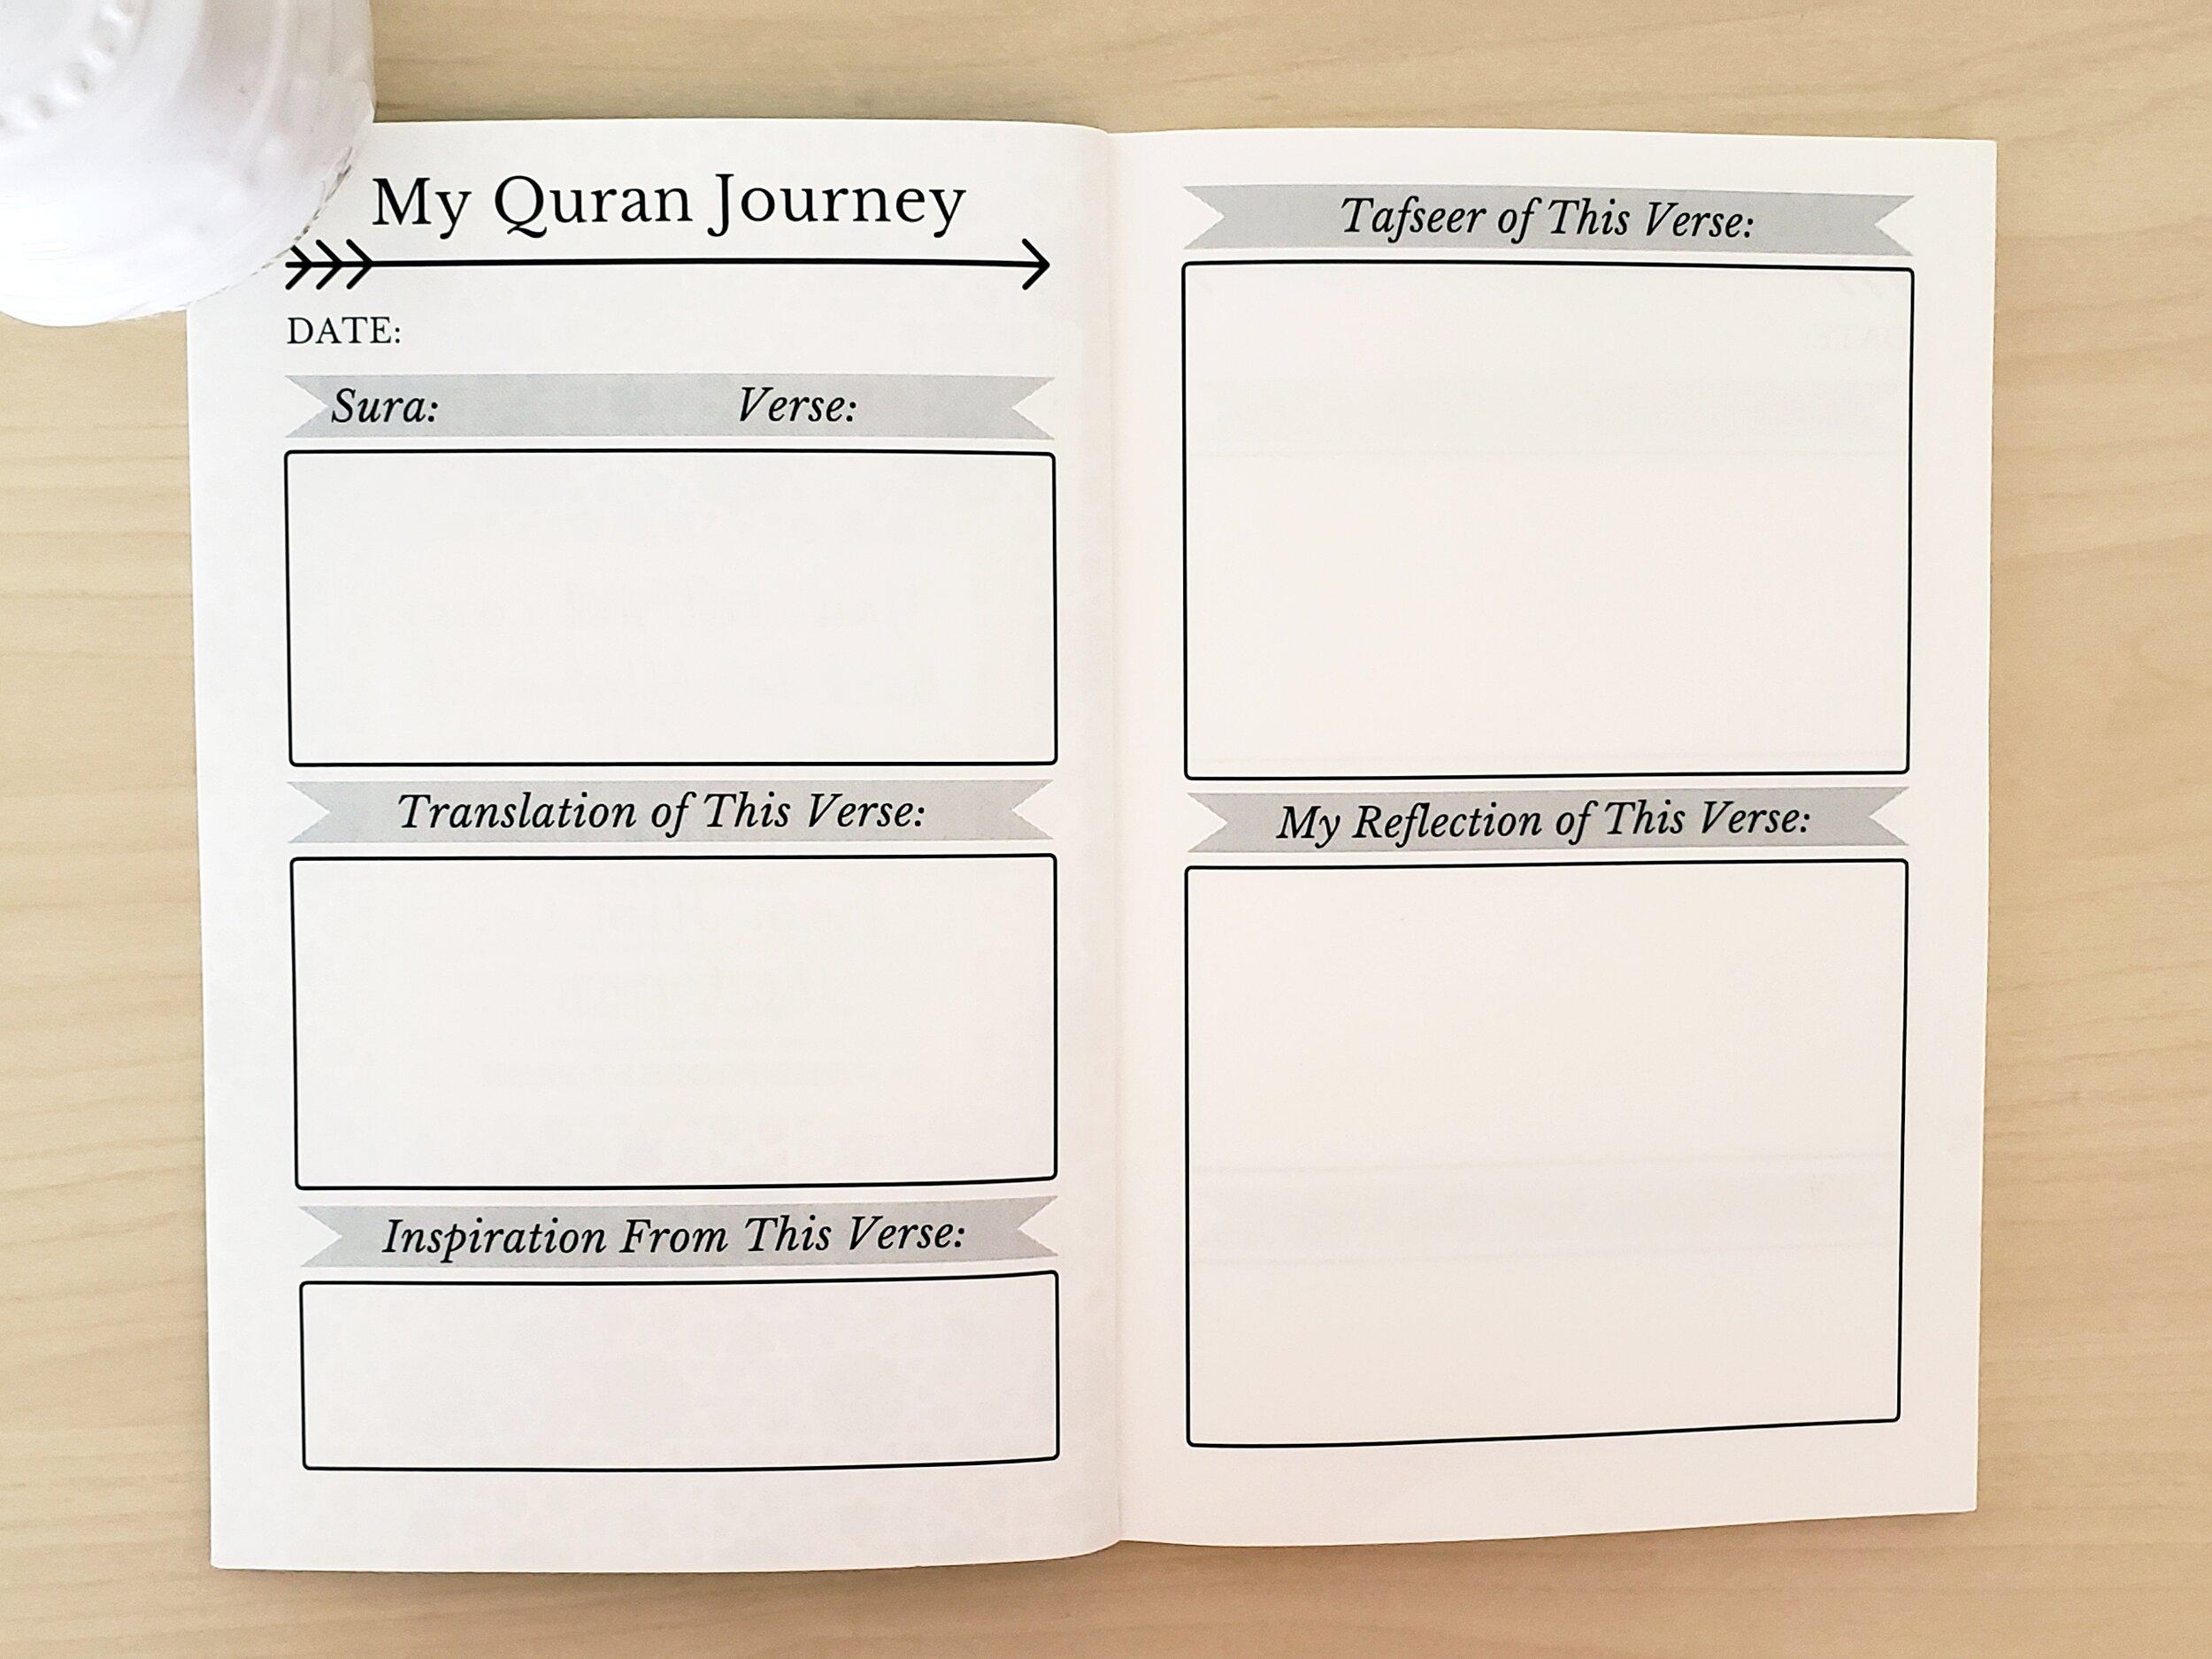 Inside Quran Journal.jpg